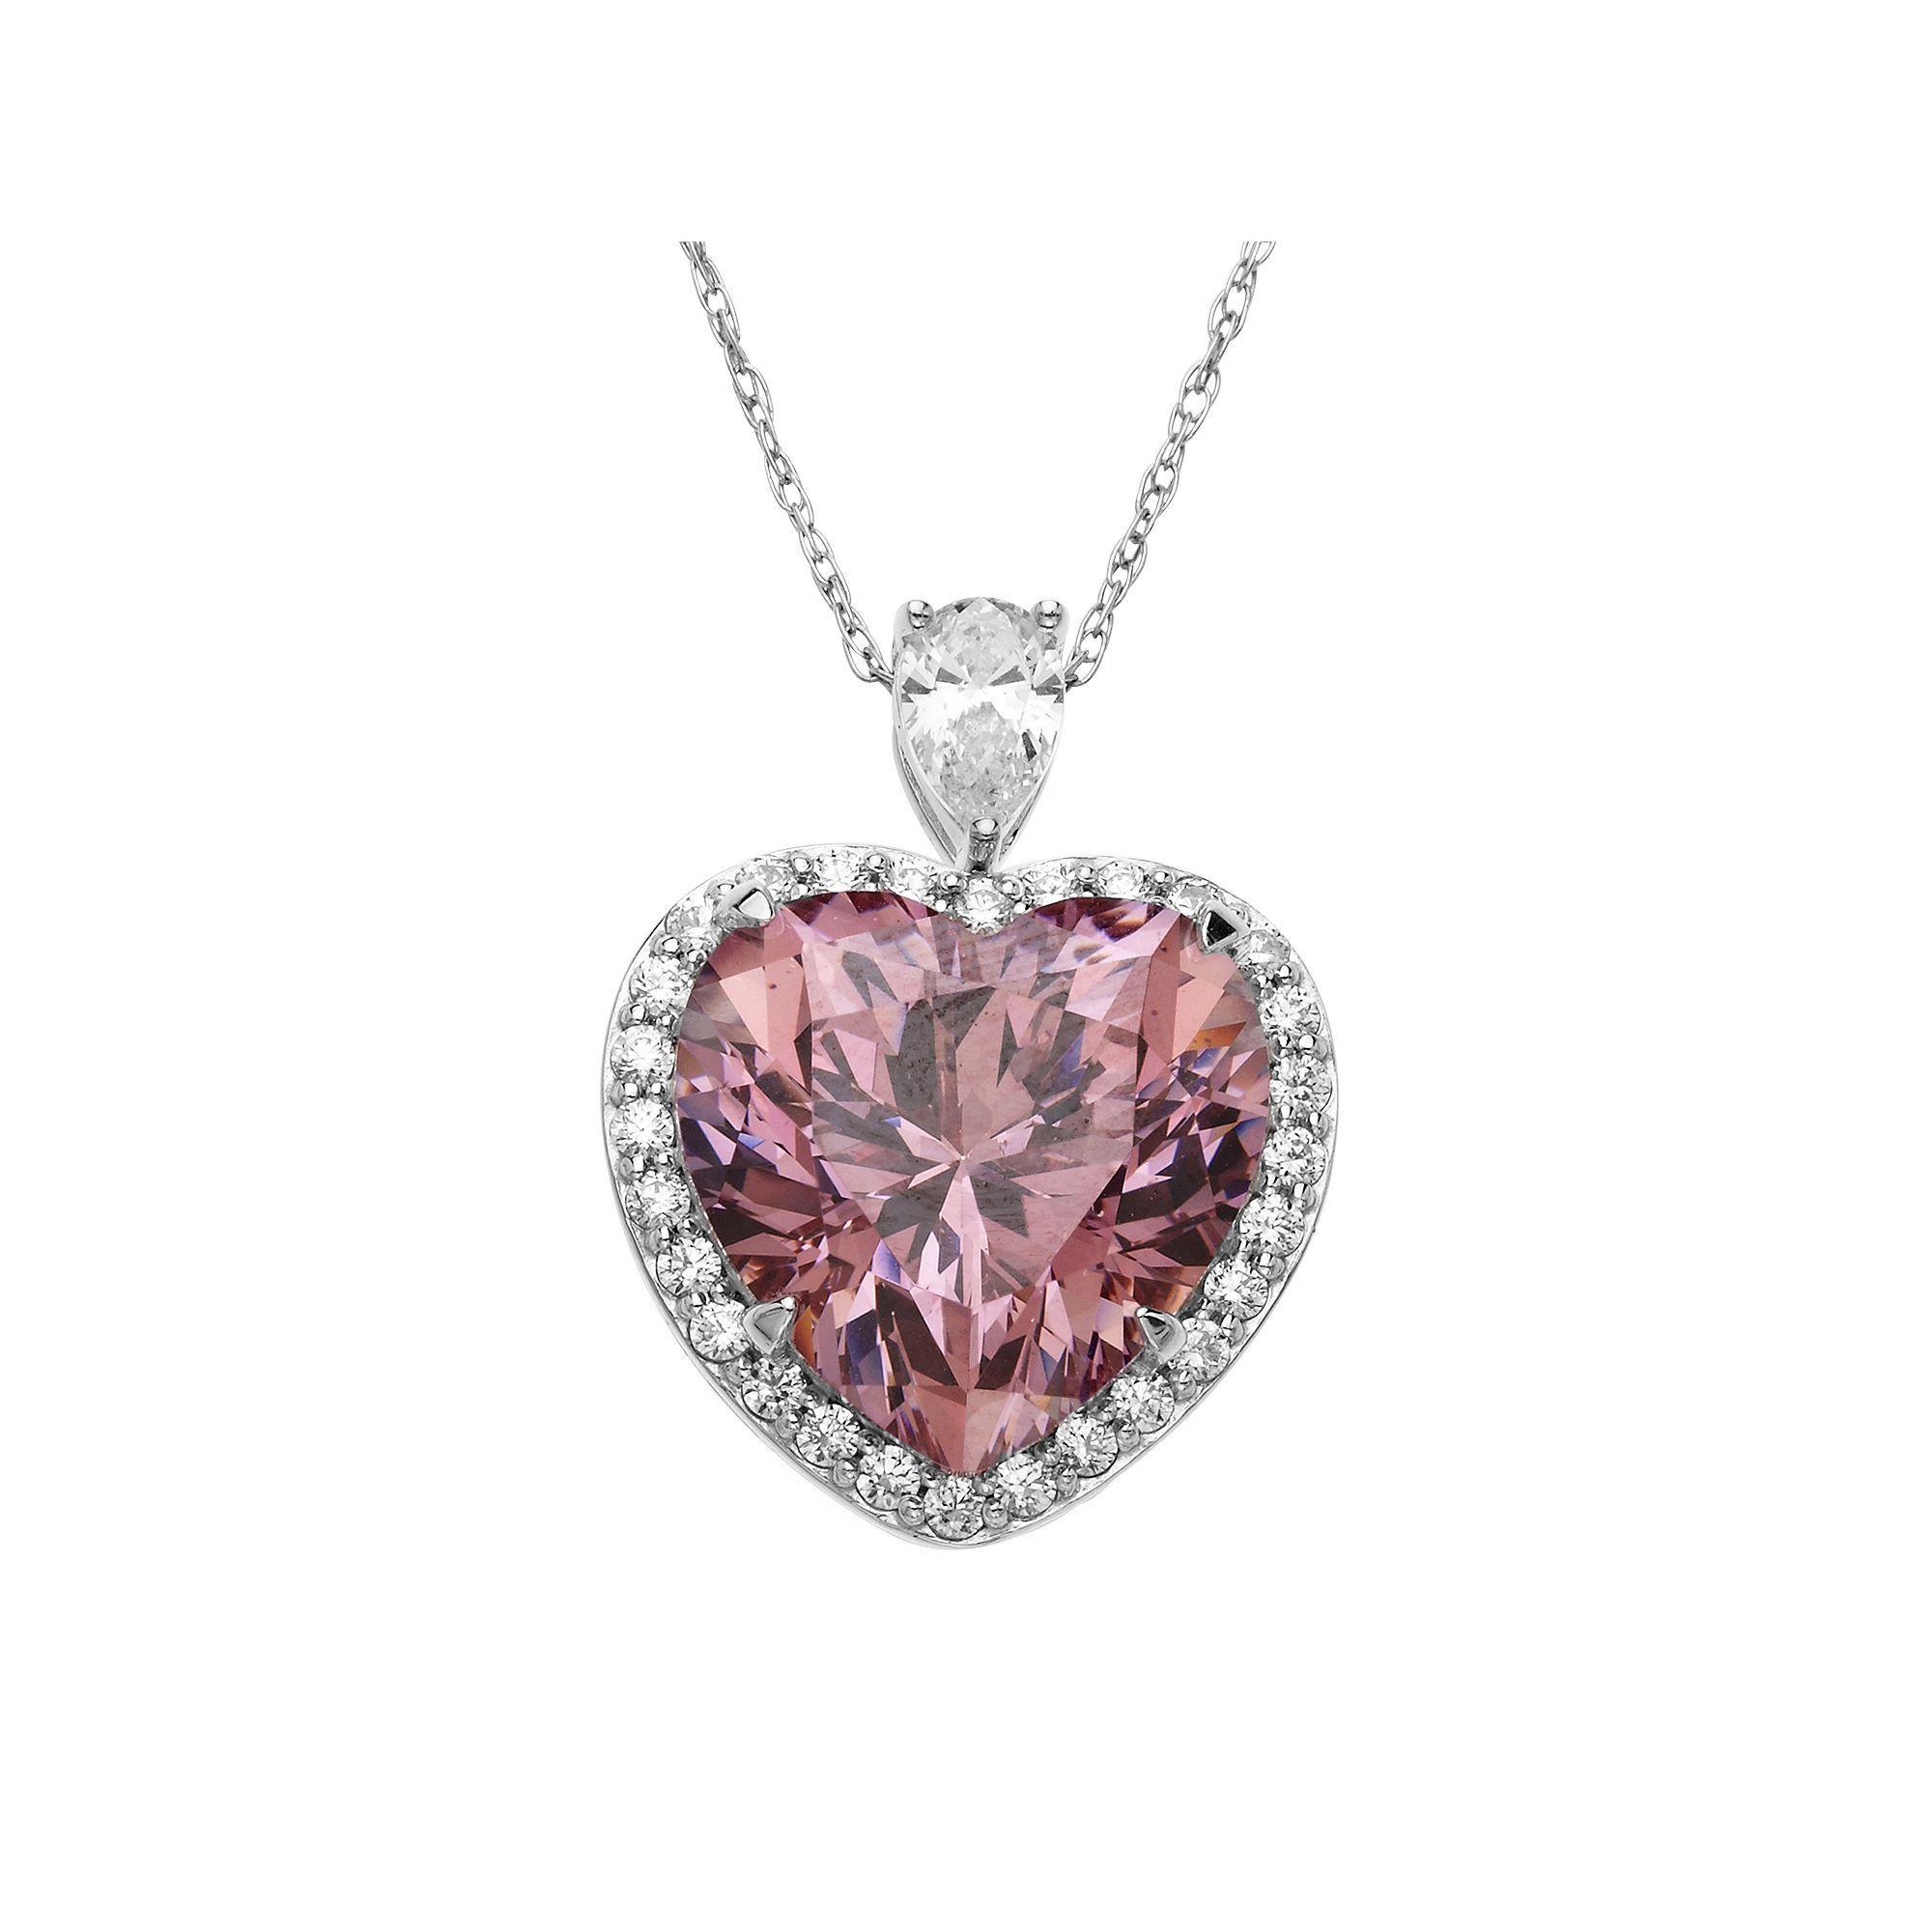 32f5bdaf9 Emotions Sterling Silver Heart Frame Pendant - Made with Swarovski Zirconia,  Women's, Pink